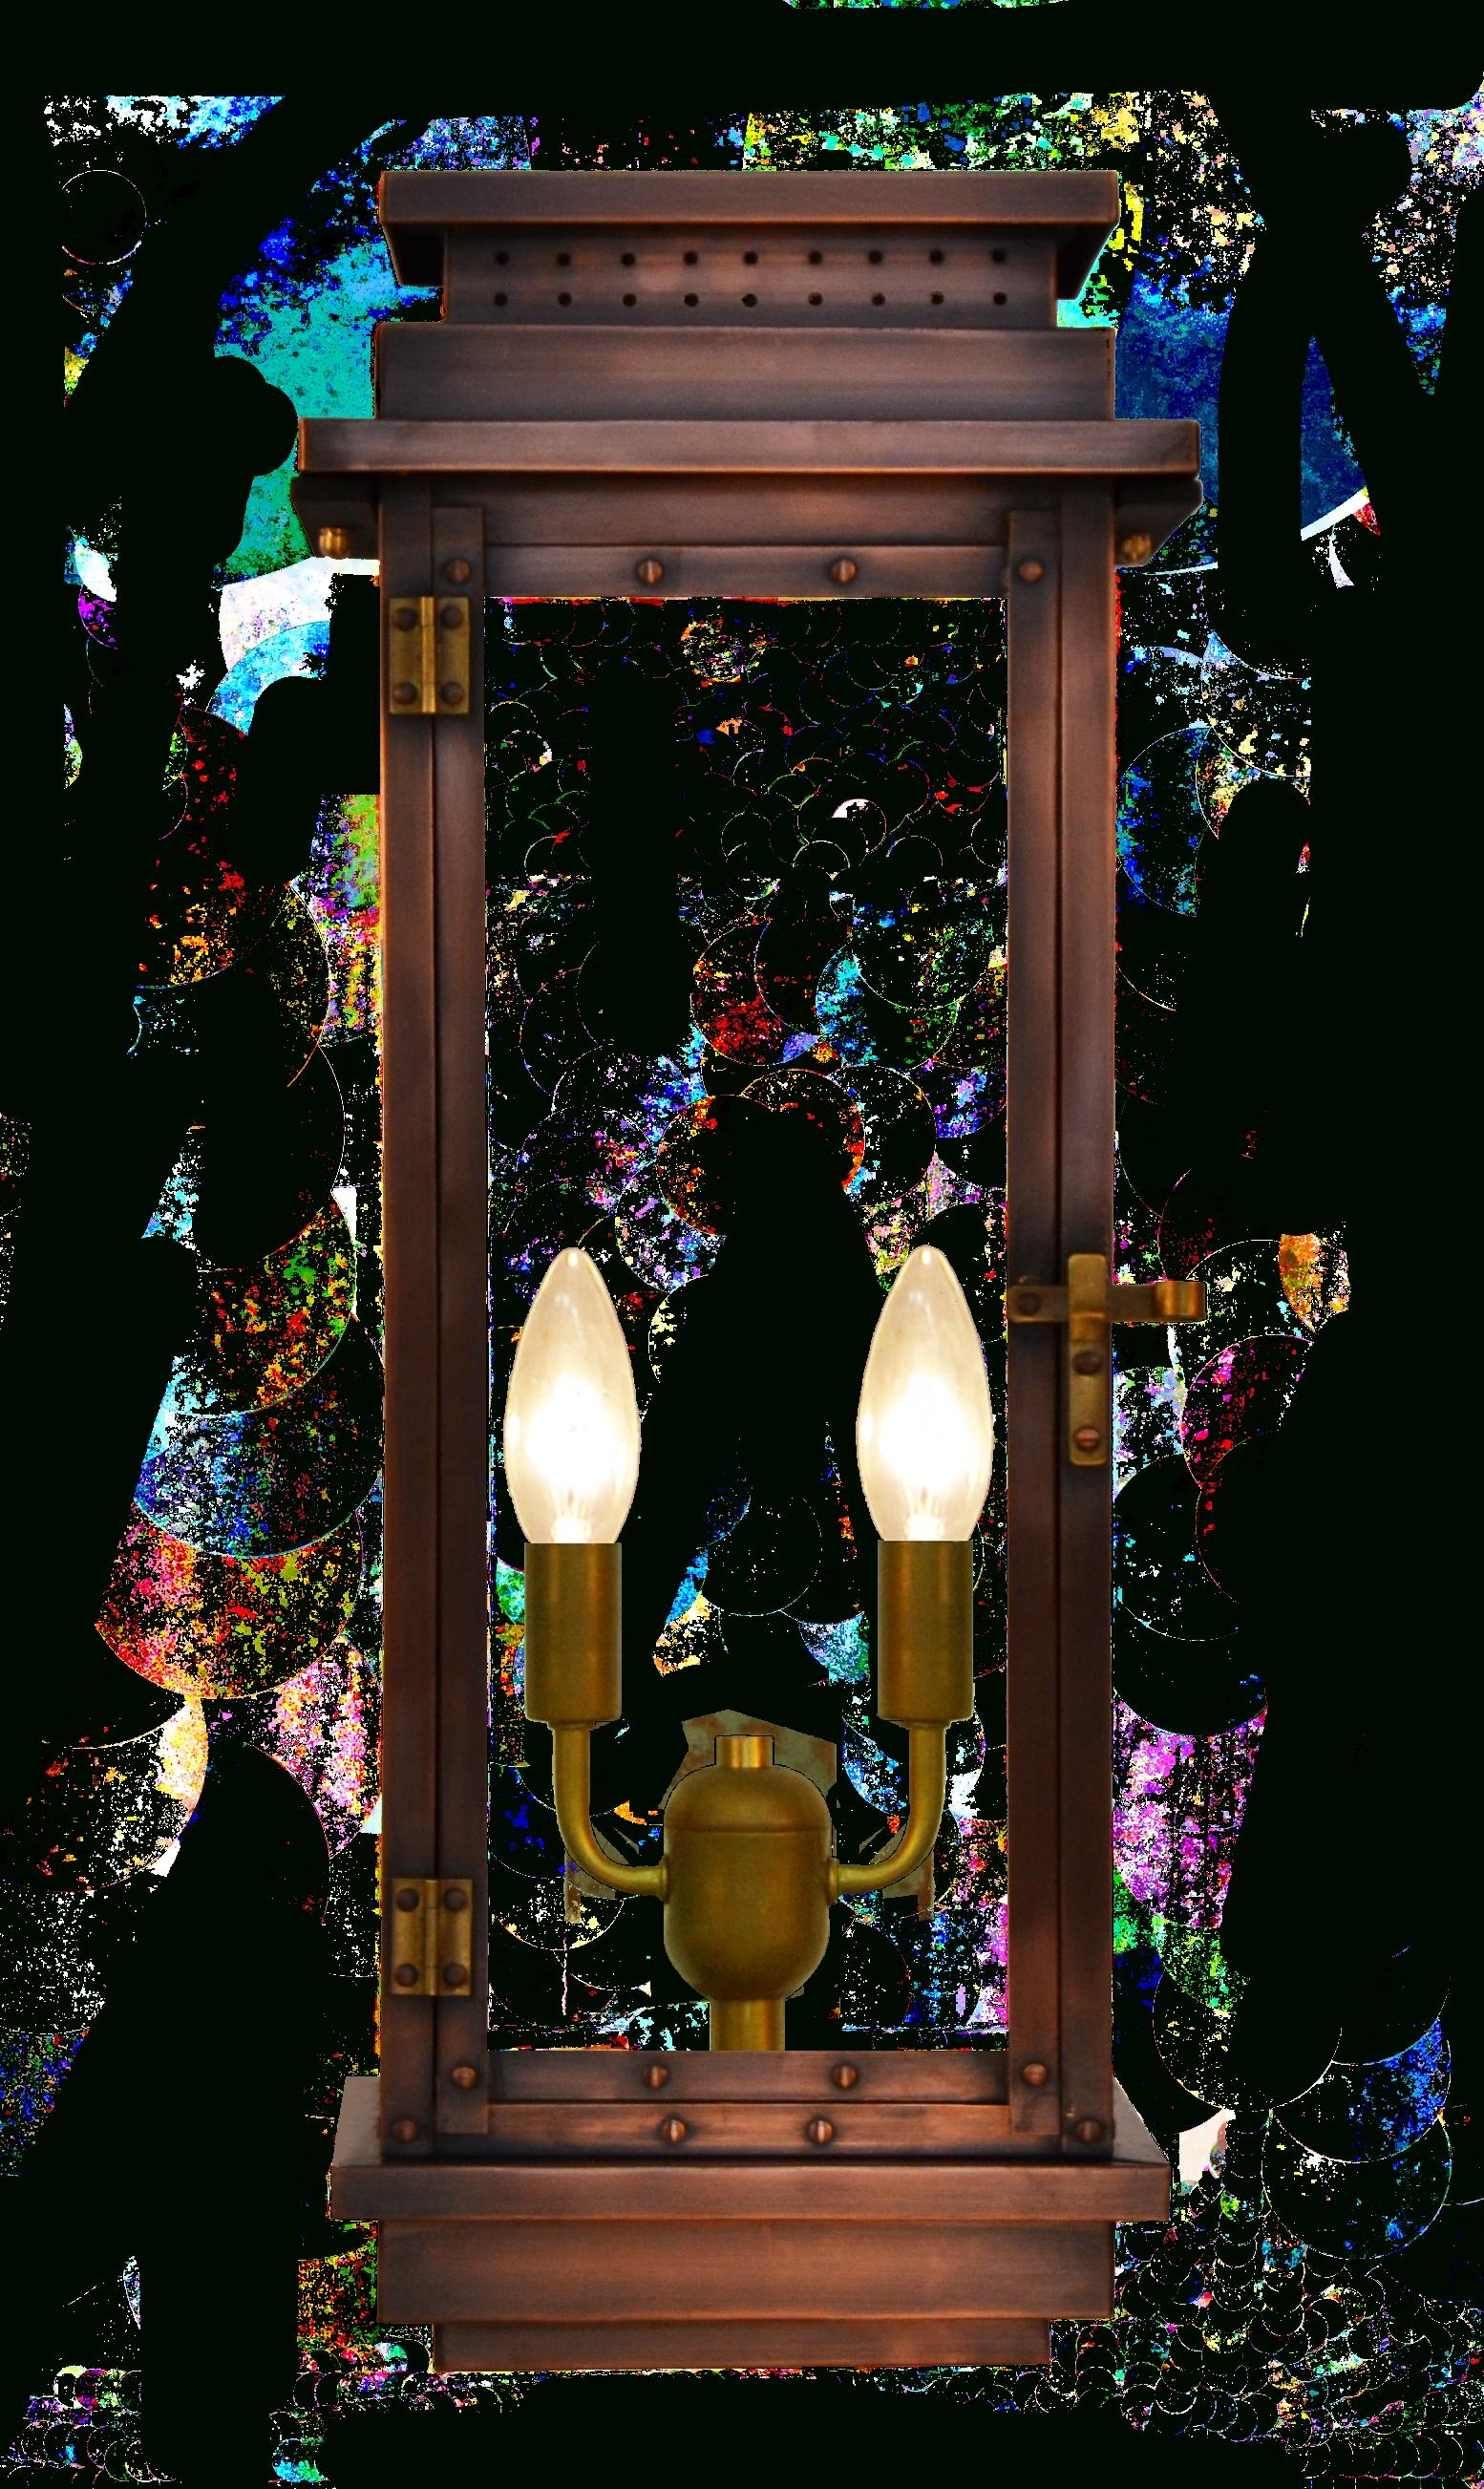 Contempo Gas Or Electric Copper Lantern - Outdoor Lighting & Lamps in Copper Outdoor Electric Lanterns (Image 5 of 20)